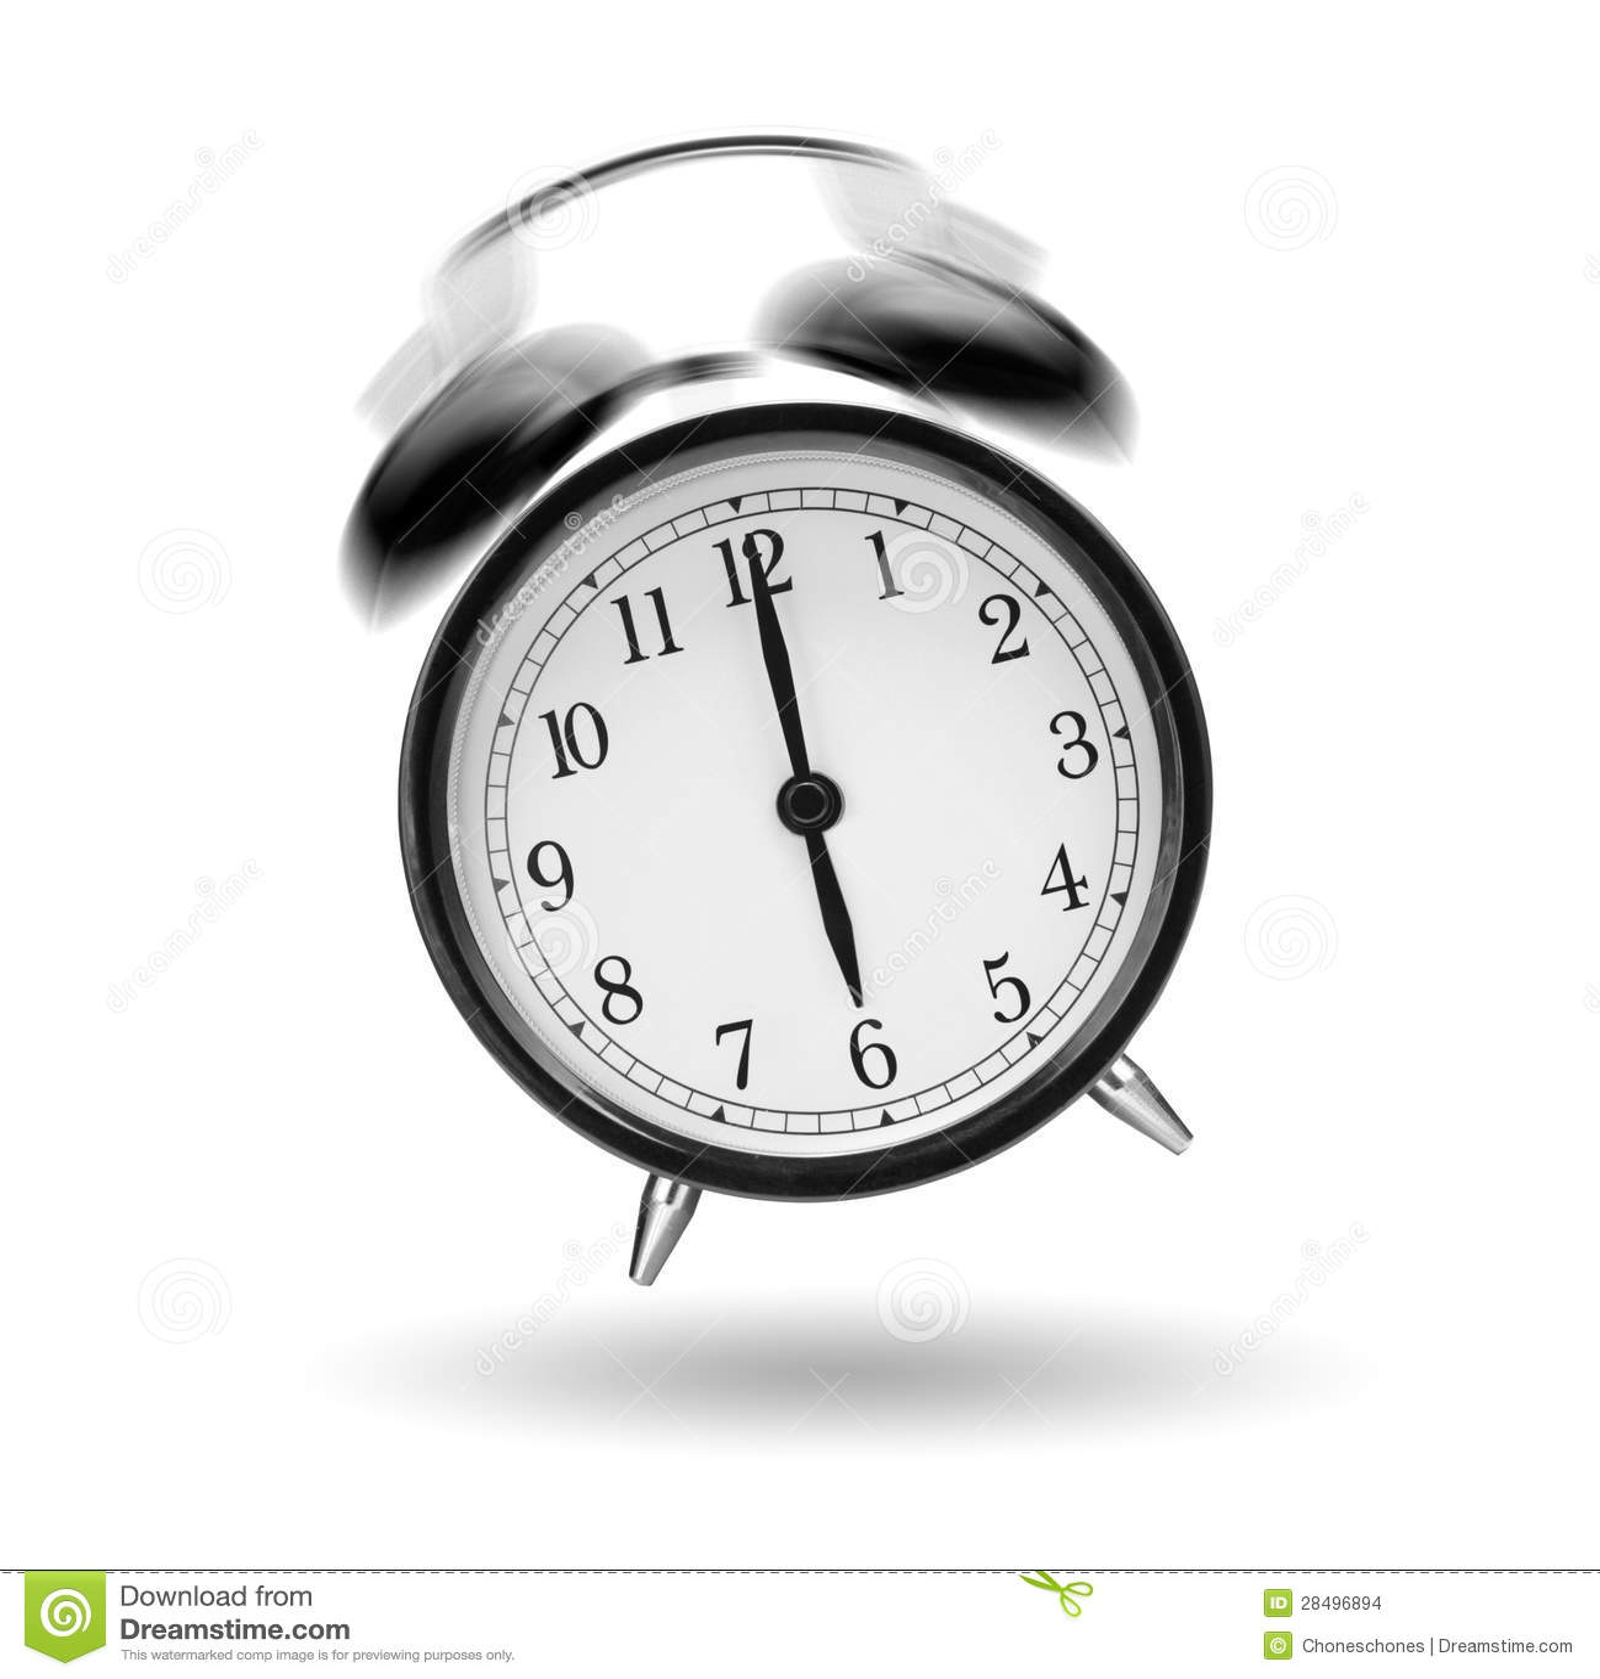 Ringing Alarm Clock Stock Images - Image: 28496894